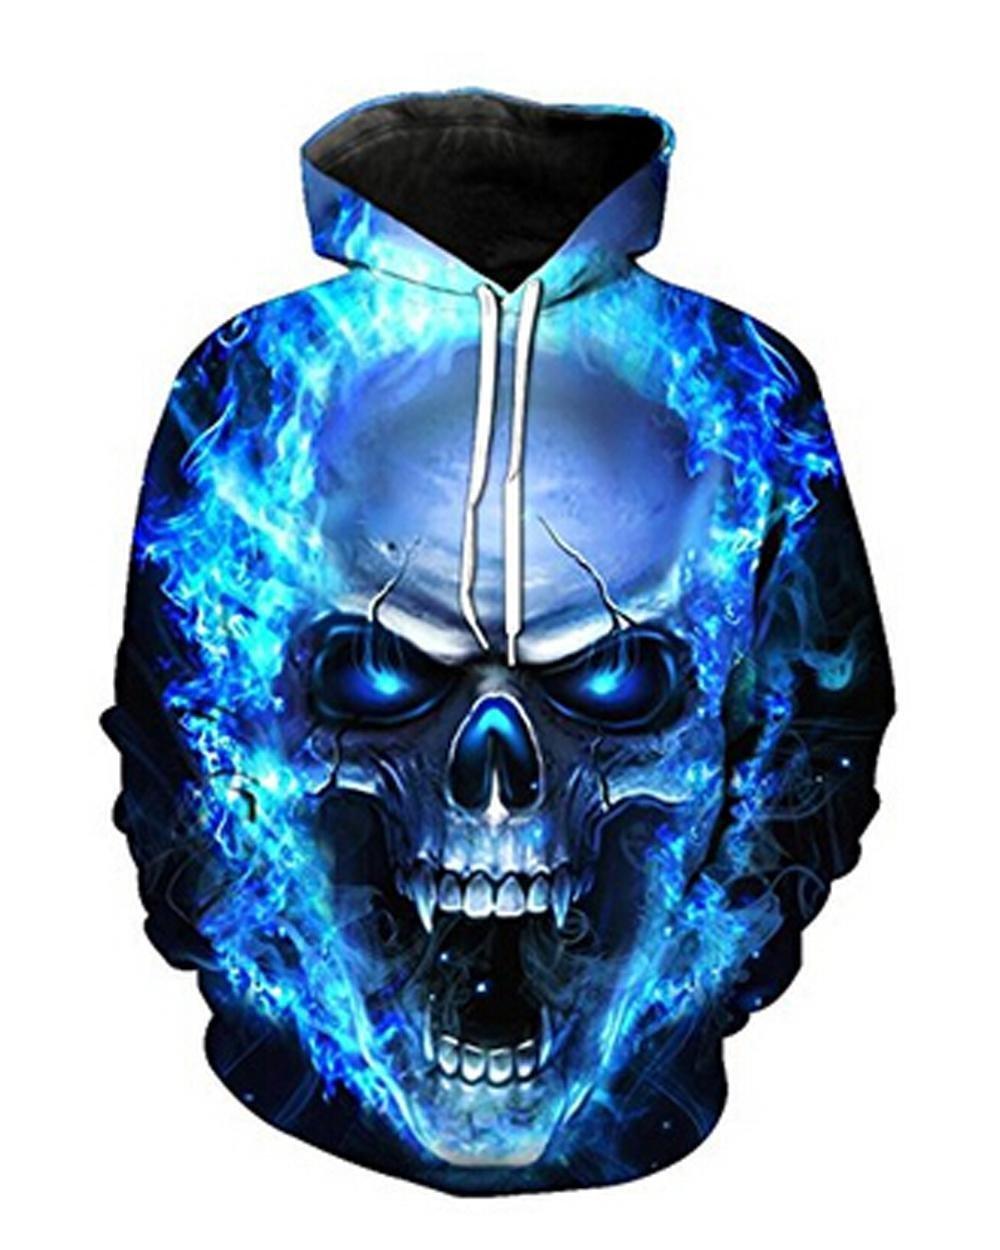 Baguet Baguuet Unisex Realistic 3d Digital Pullover Sweatshirt Hooded With Pocket (S-XXXL)